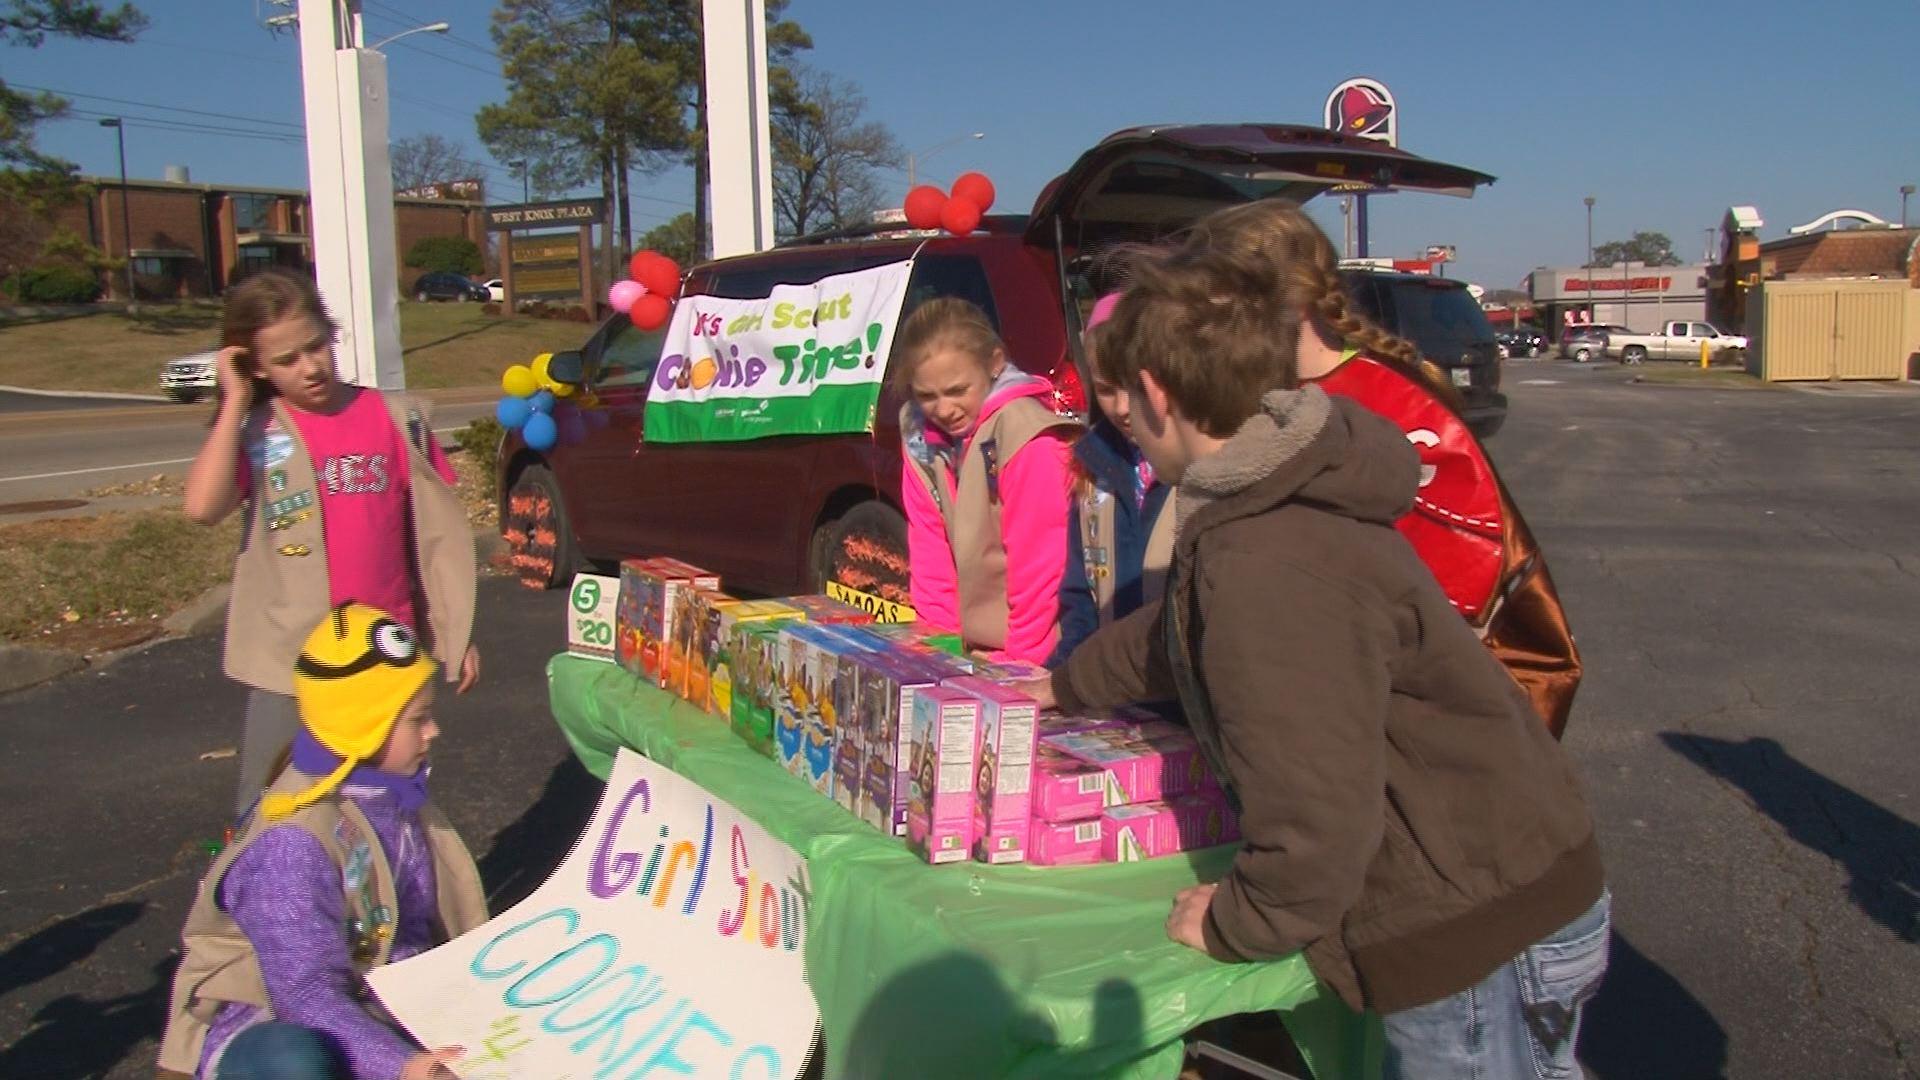 Wbir Weather And News >> wbir.com | Girl Scounts sell cookies at drive thru